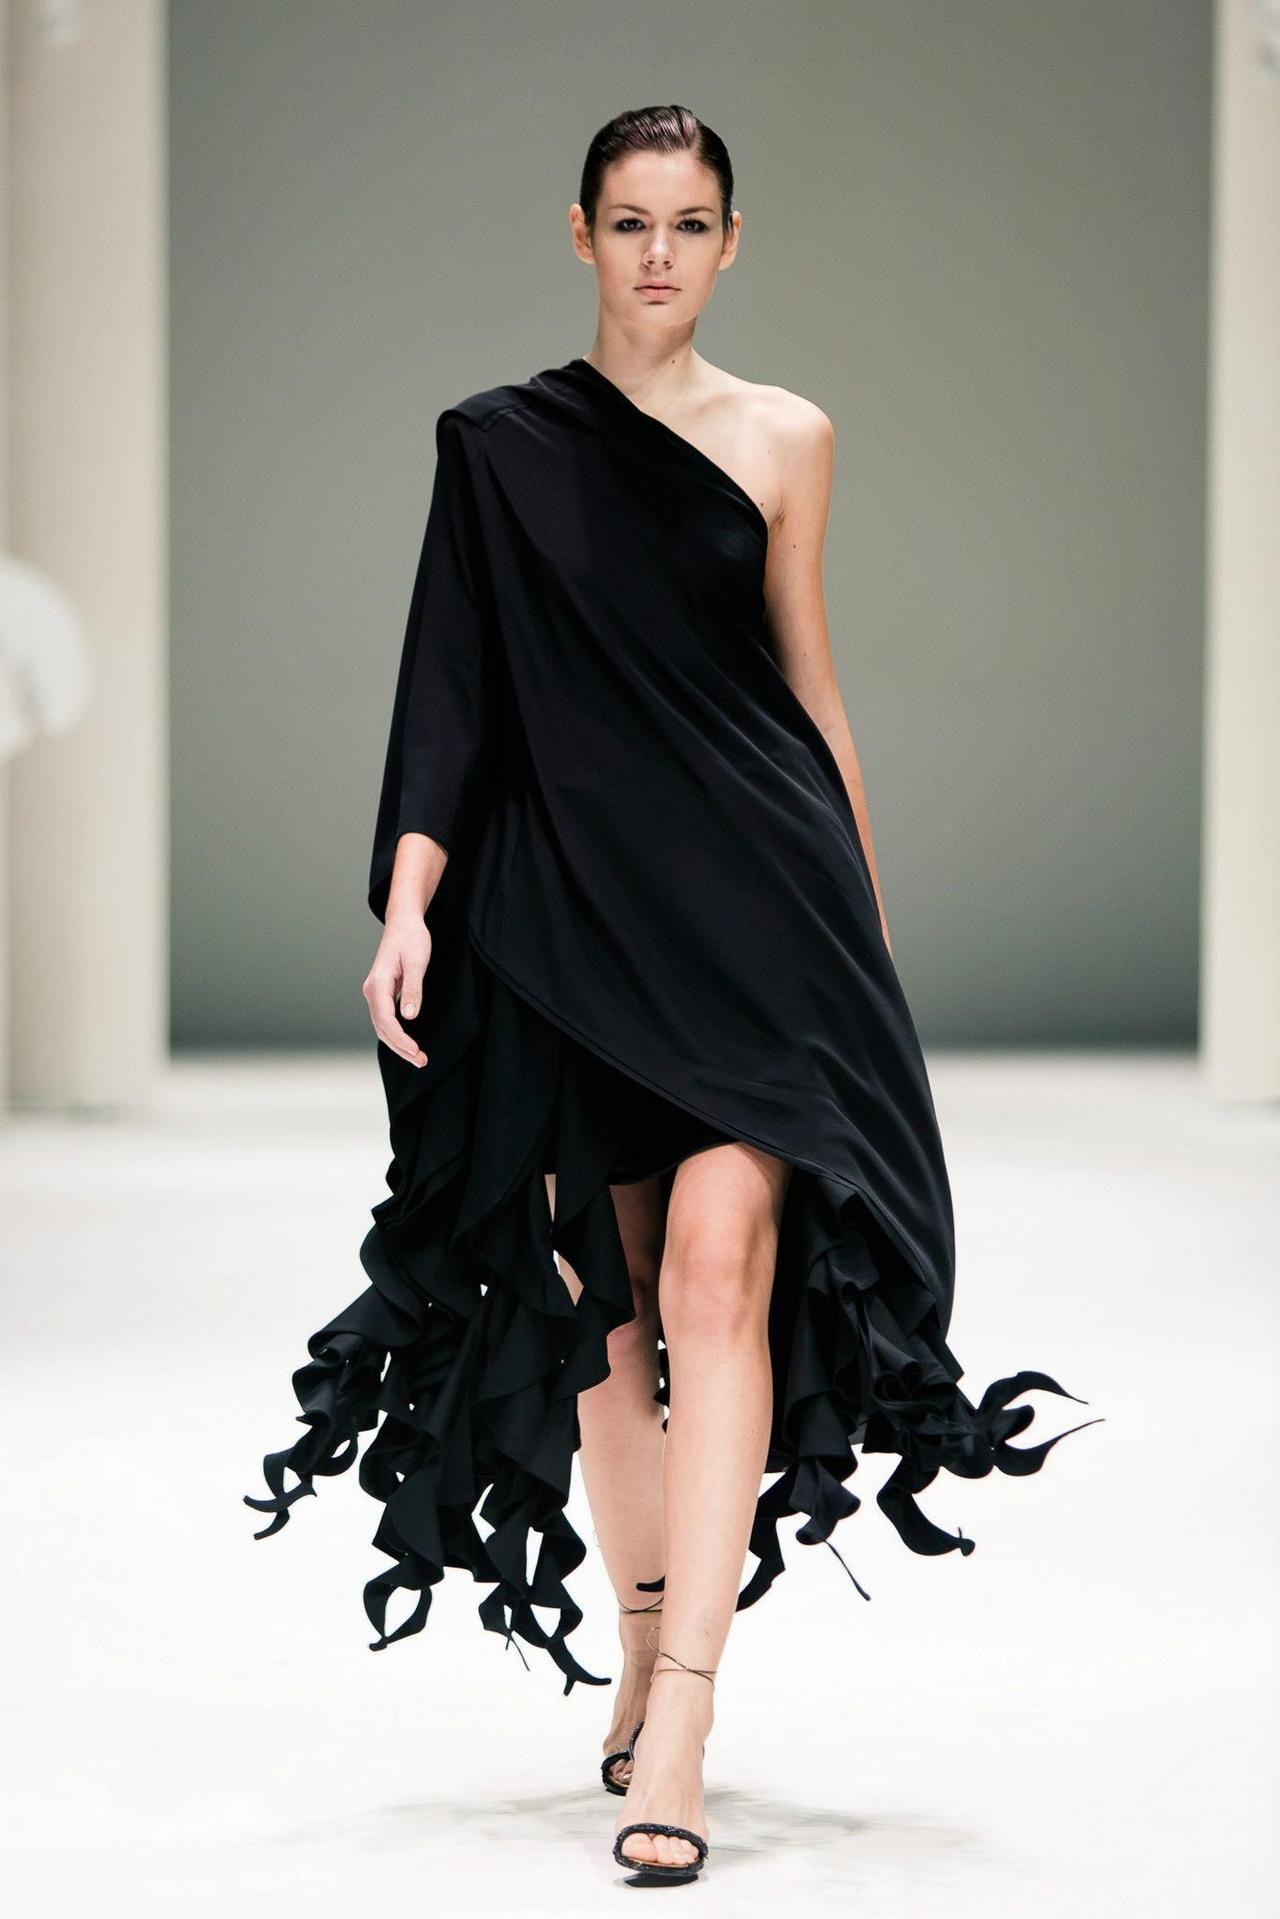 Between Craftsmanship & Industrial Design At Fide Fashion Week 2012 ...